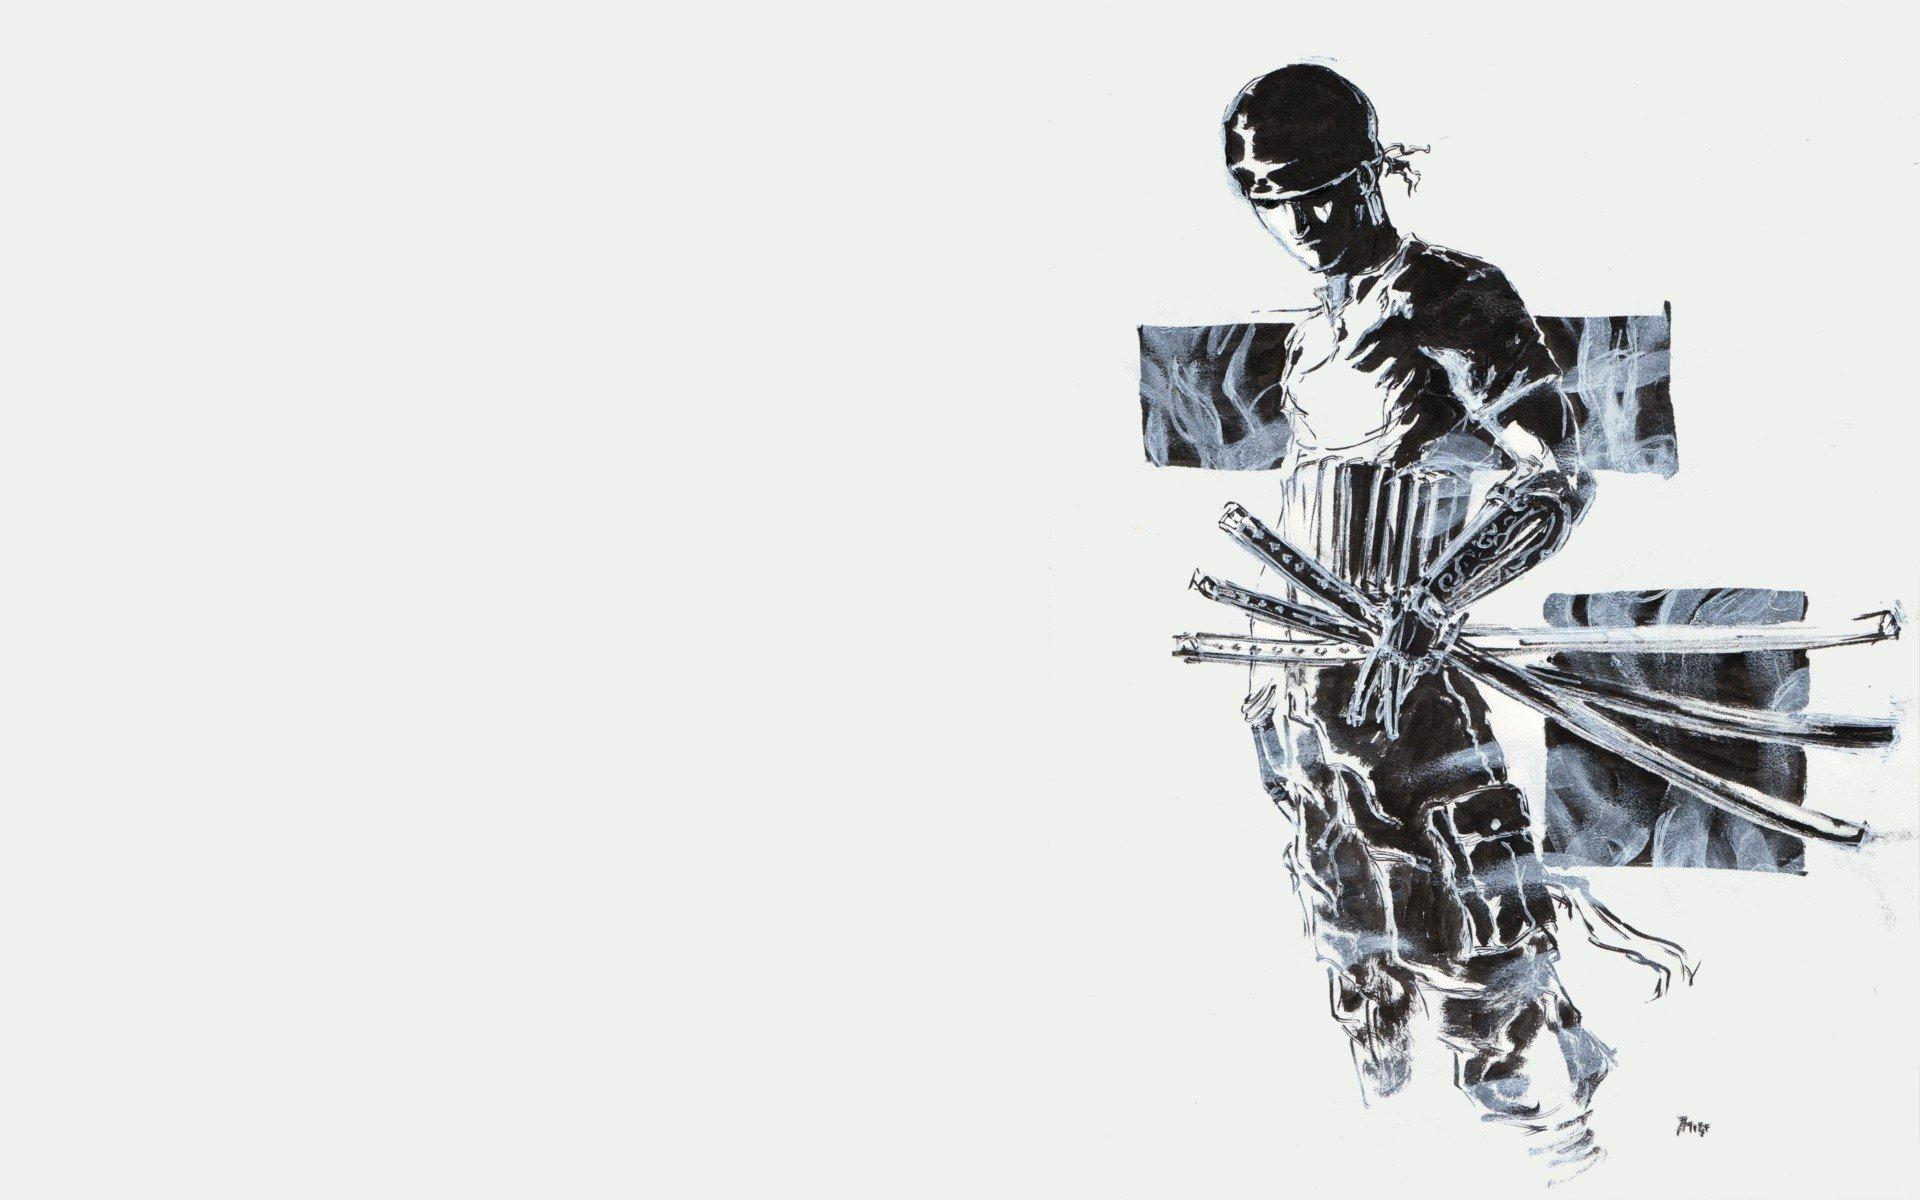 Roronoa Zoro Wallpaper Hd Black